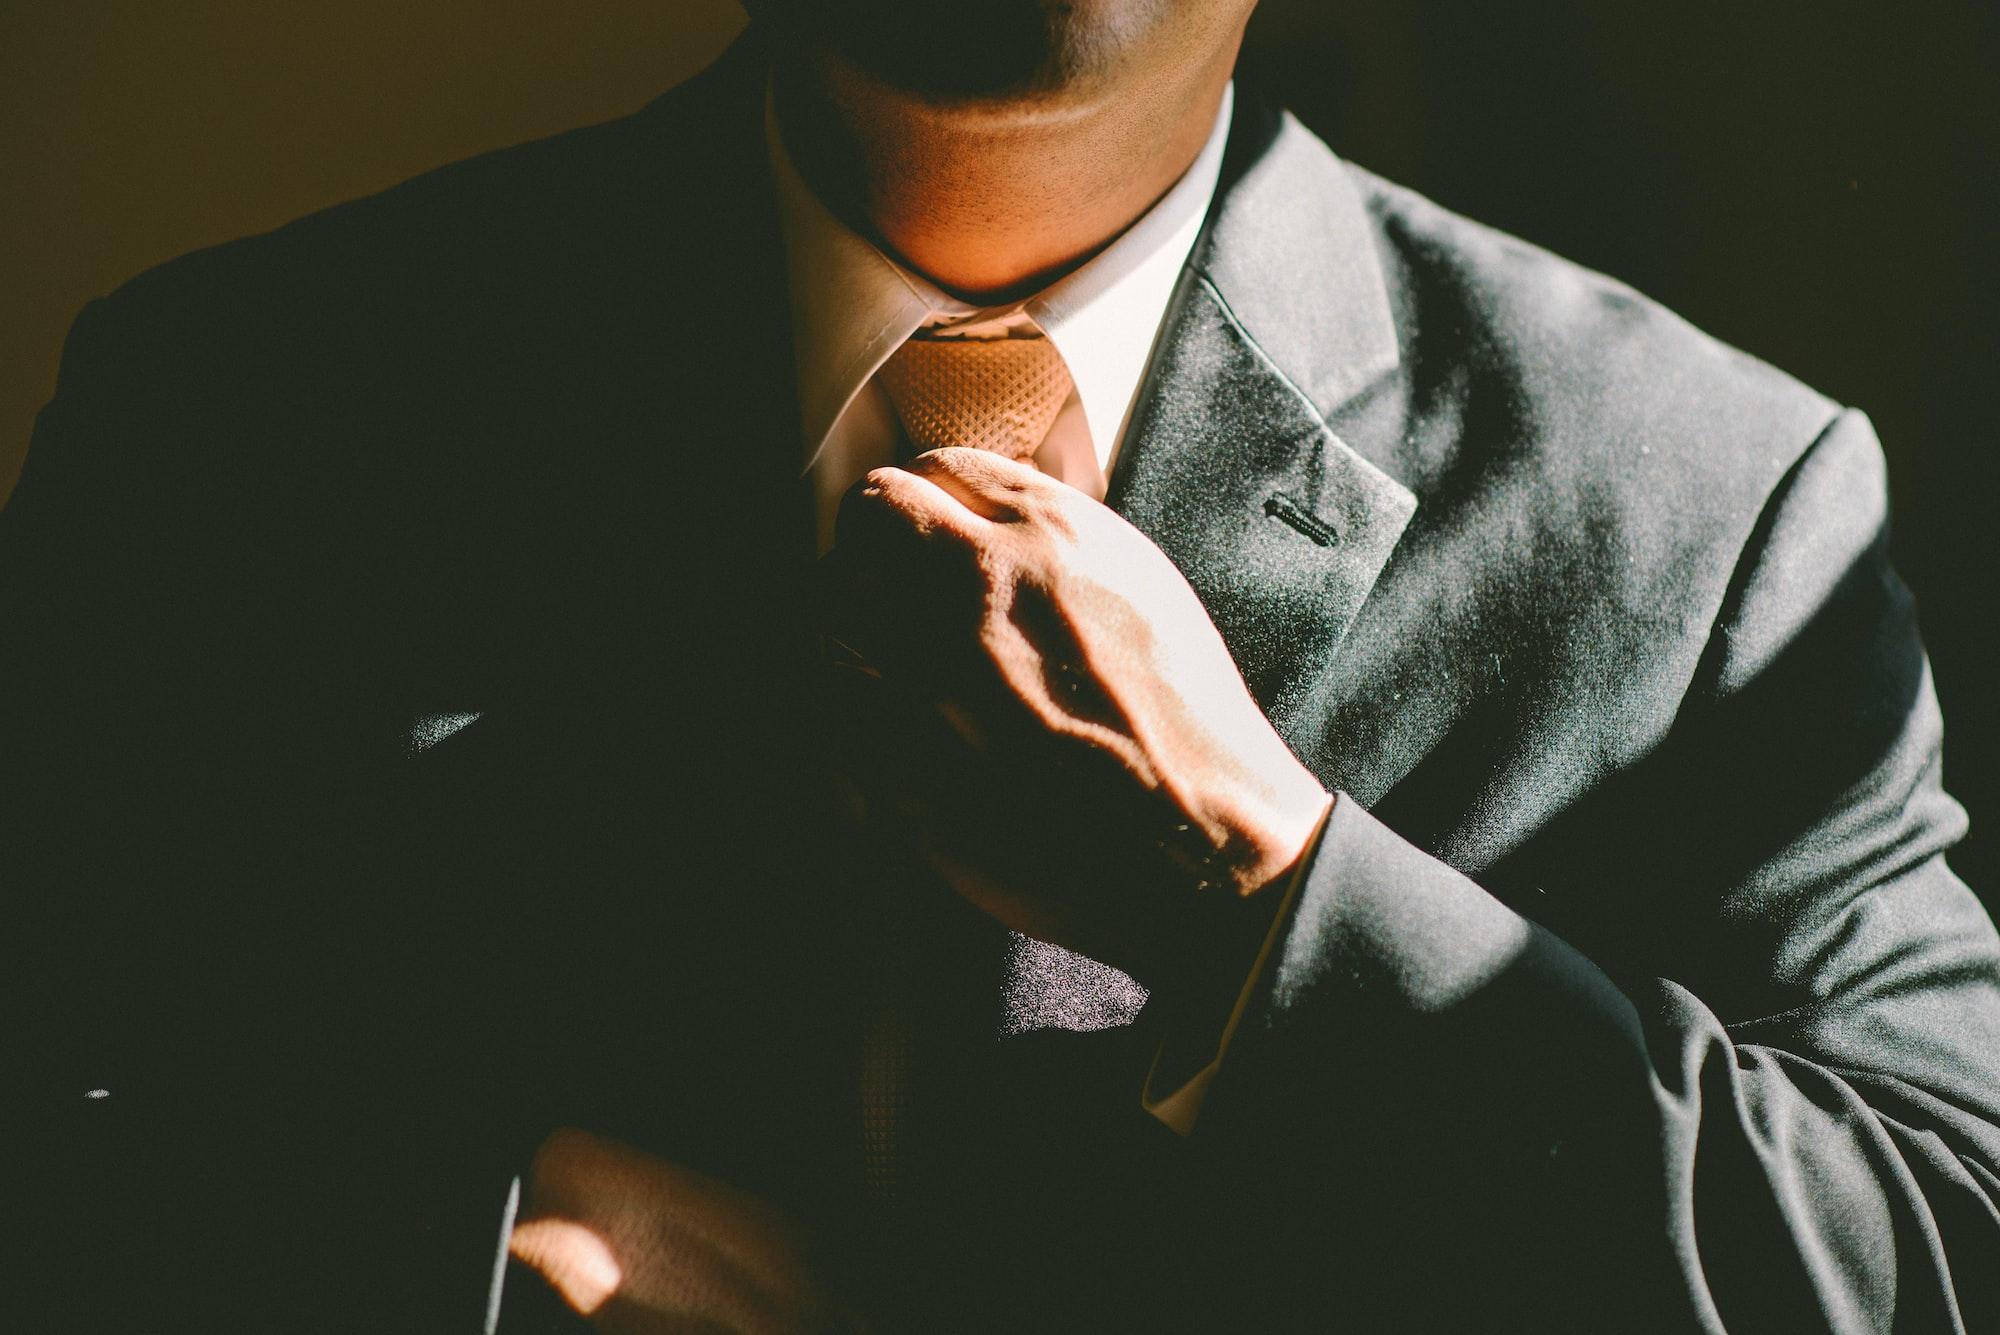 COASSF-18-10 Reflections of a CFO